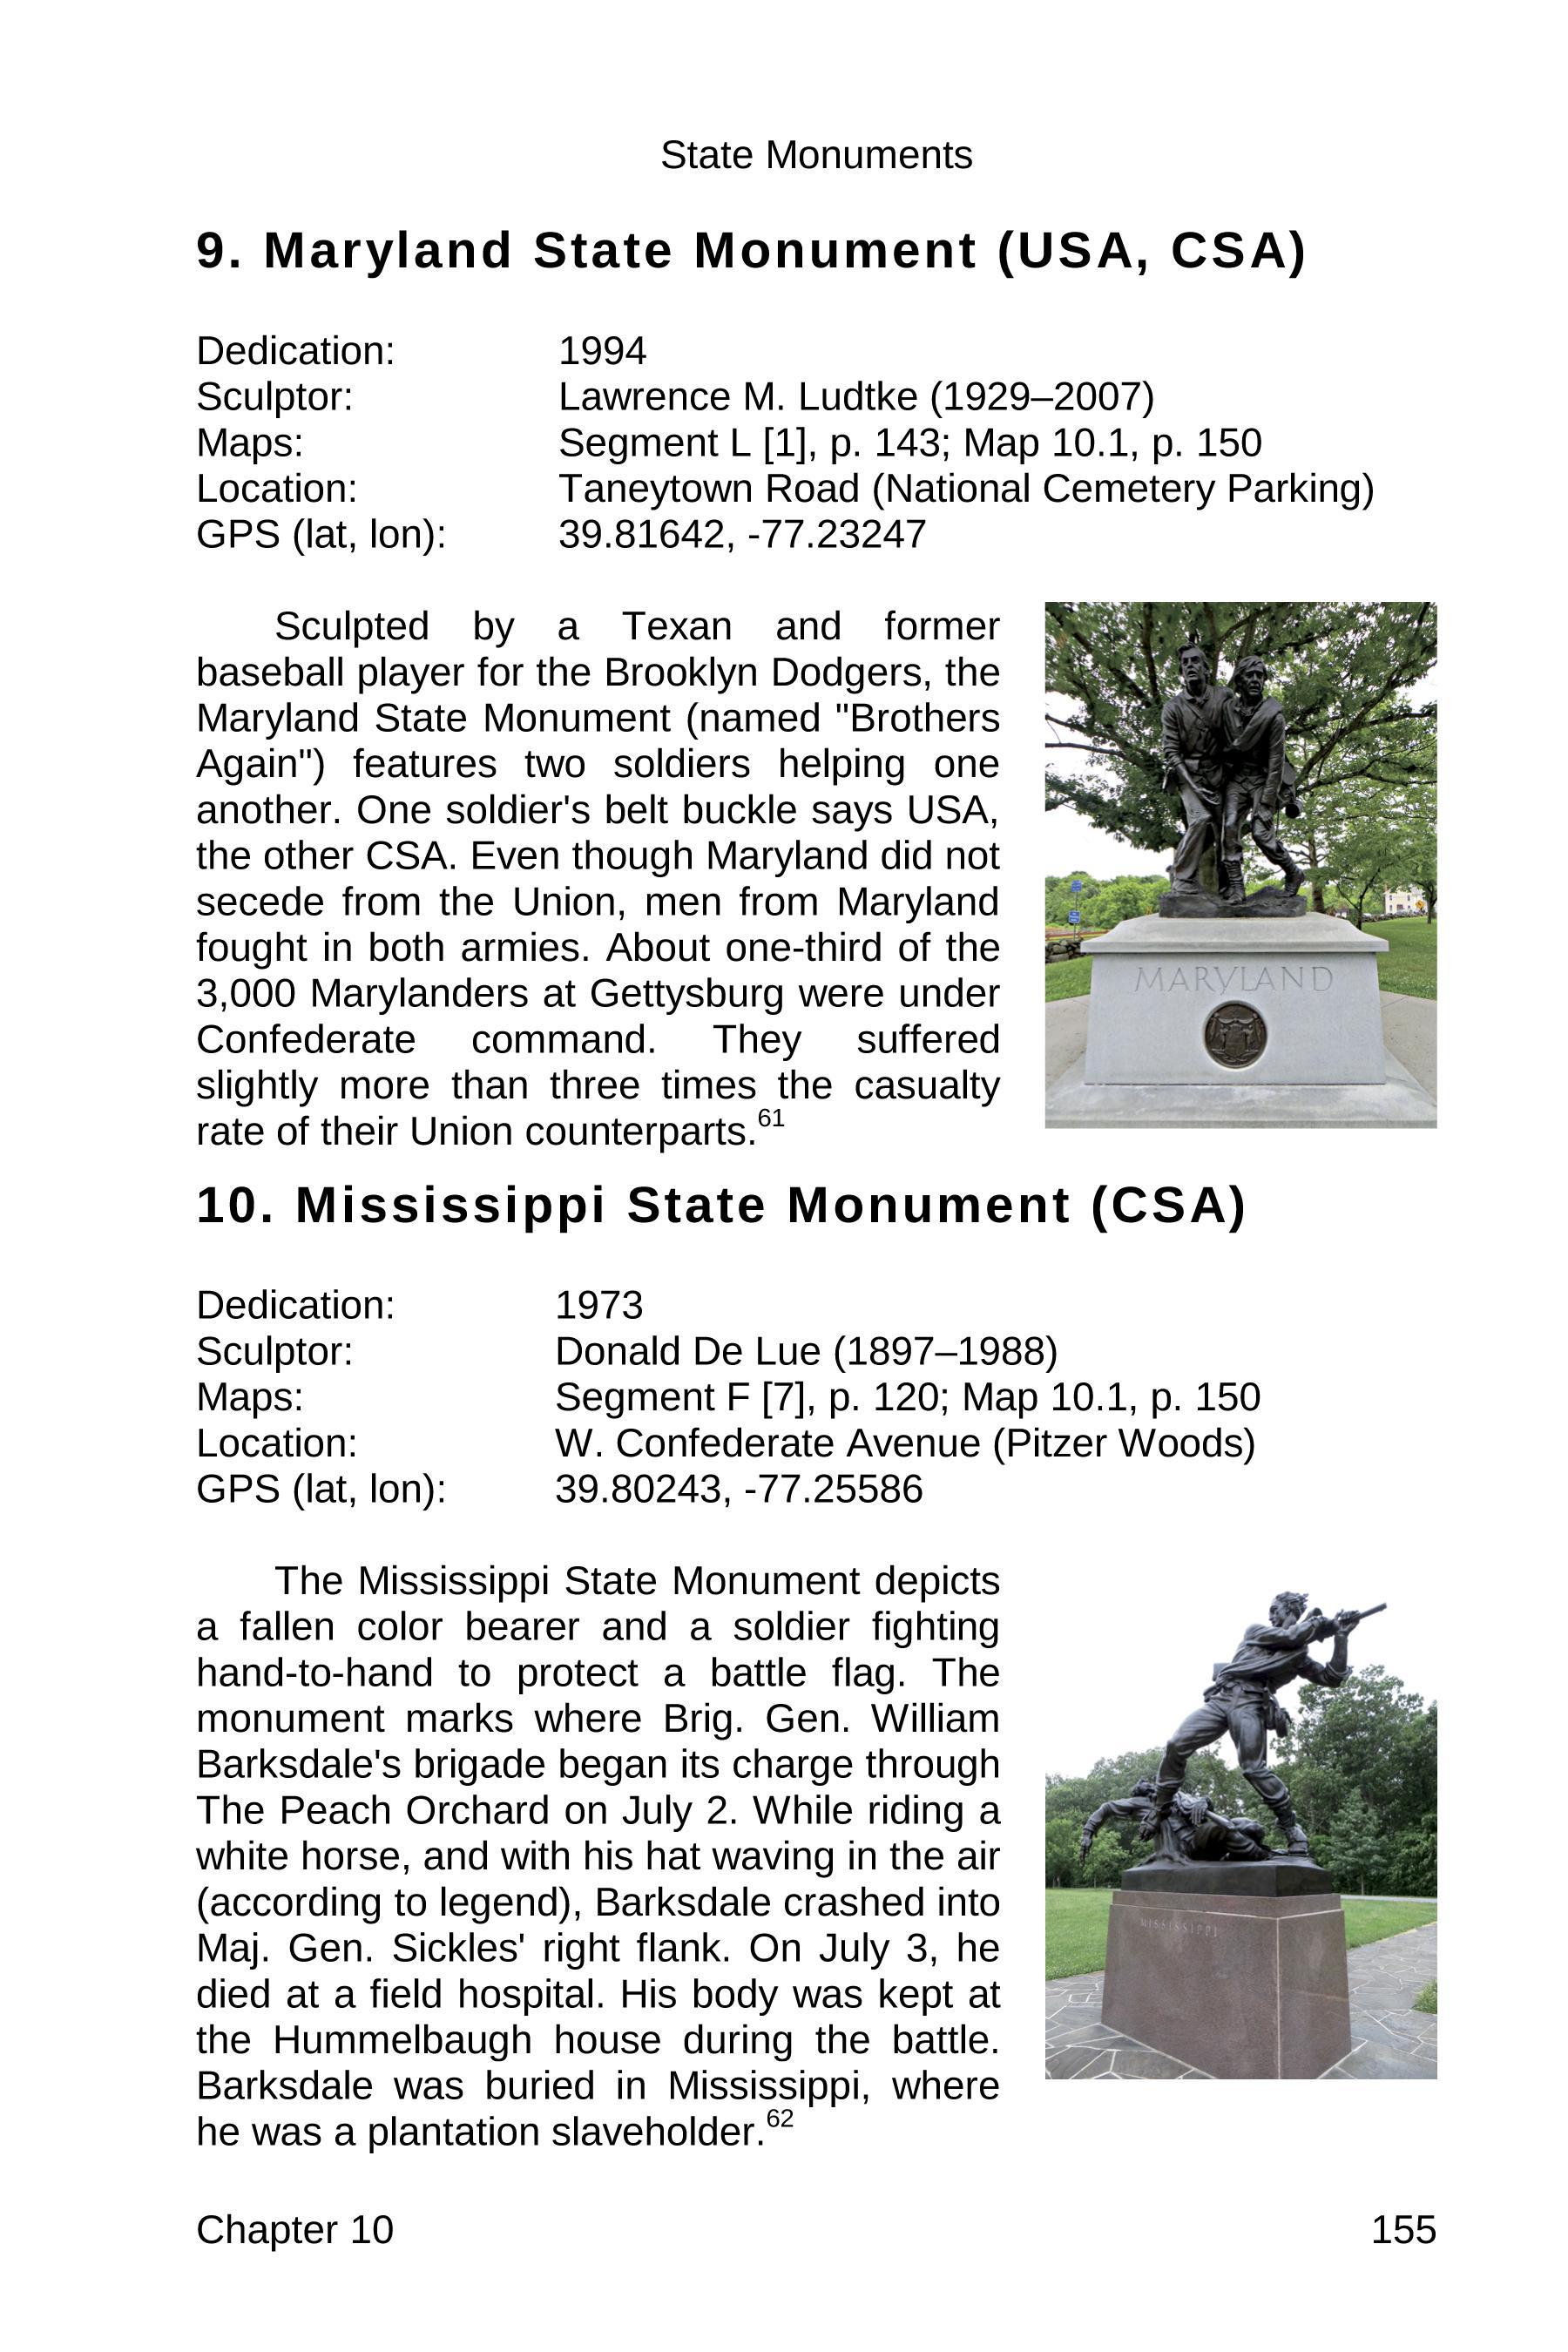 gettysburg state monuments sample 155